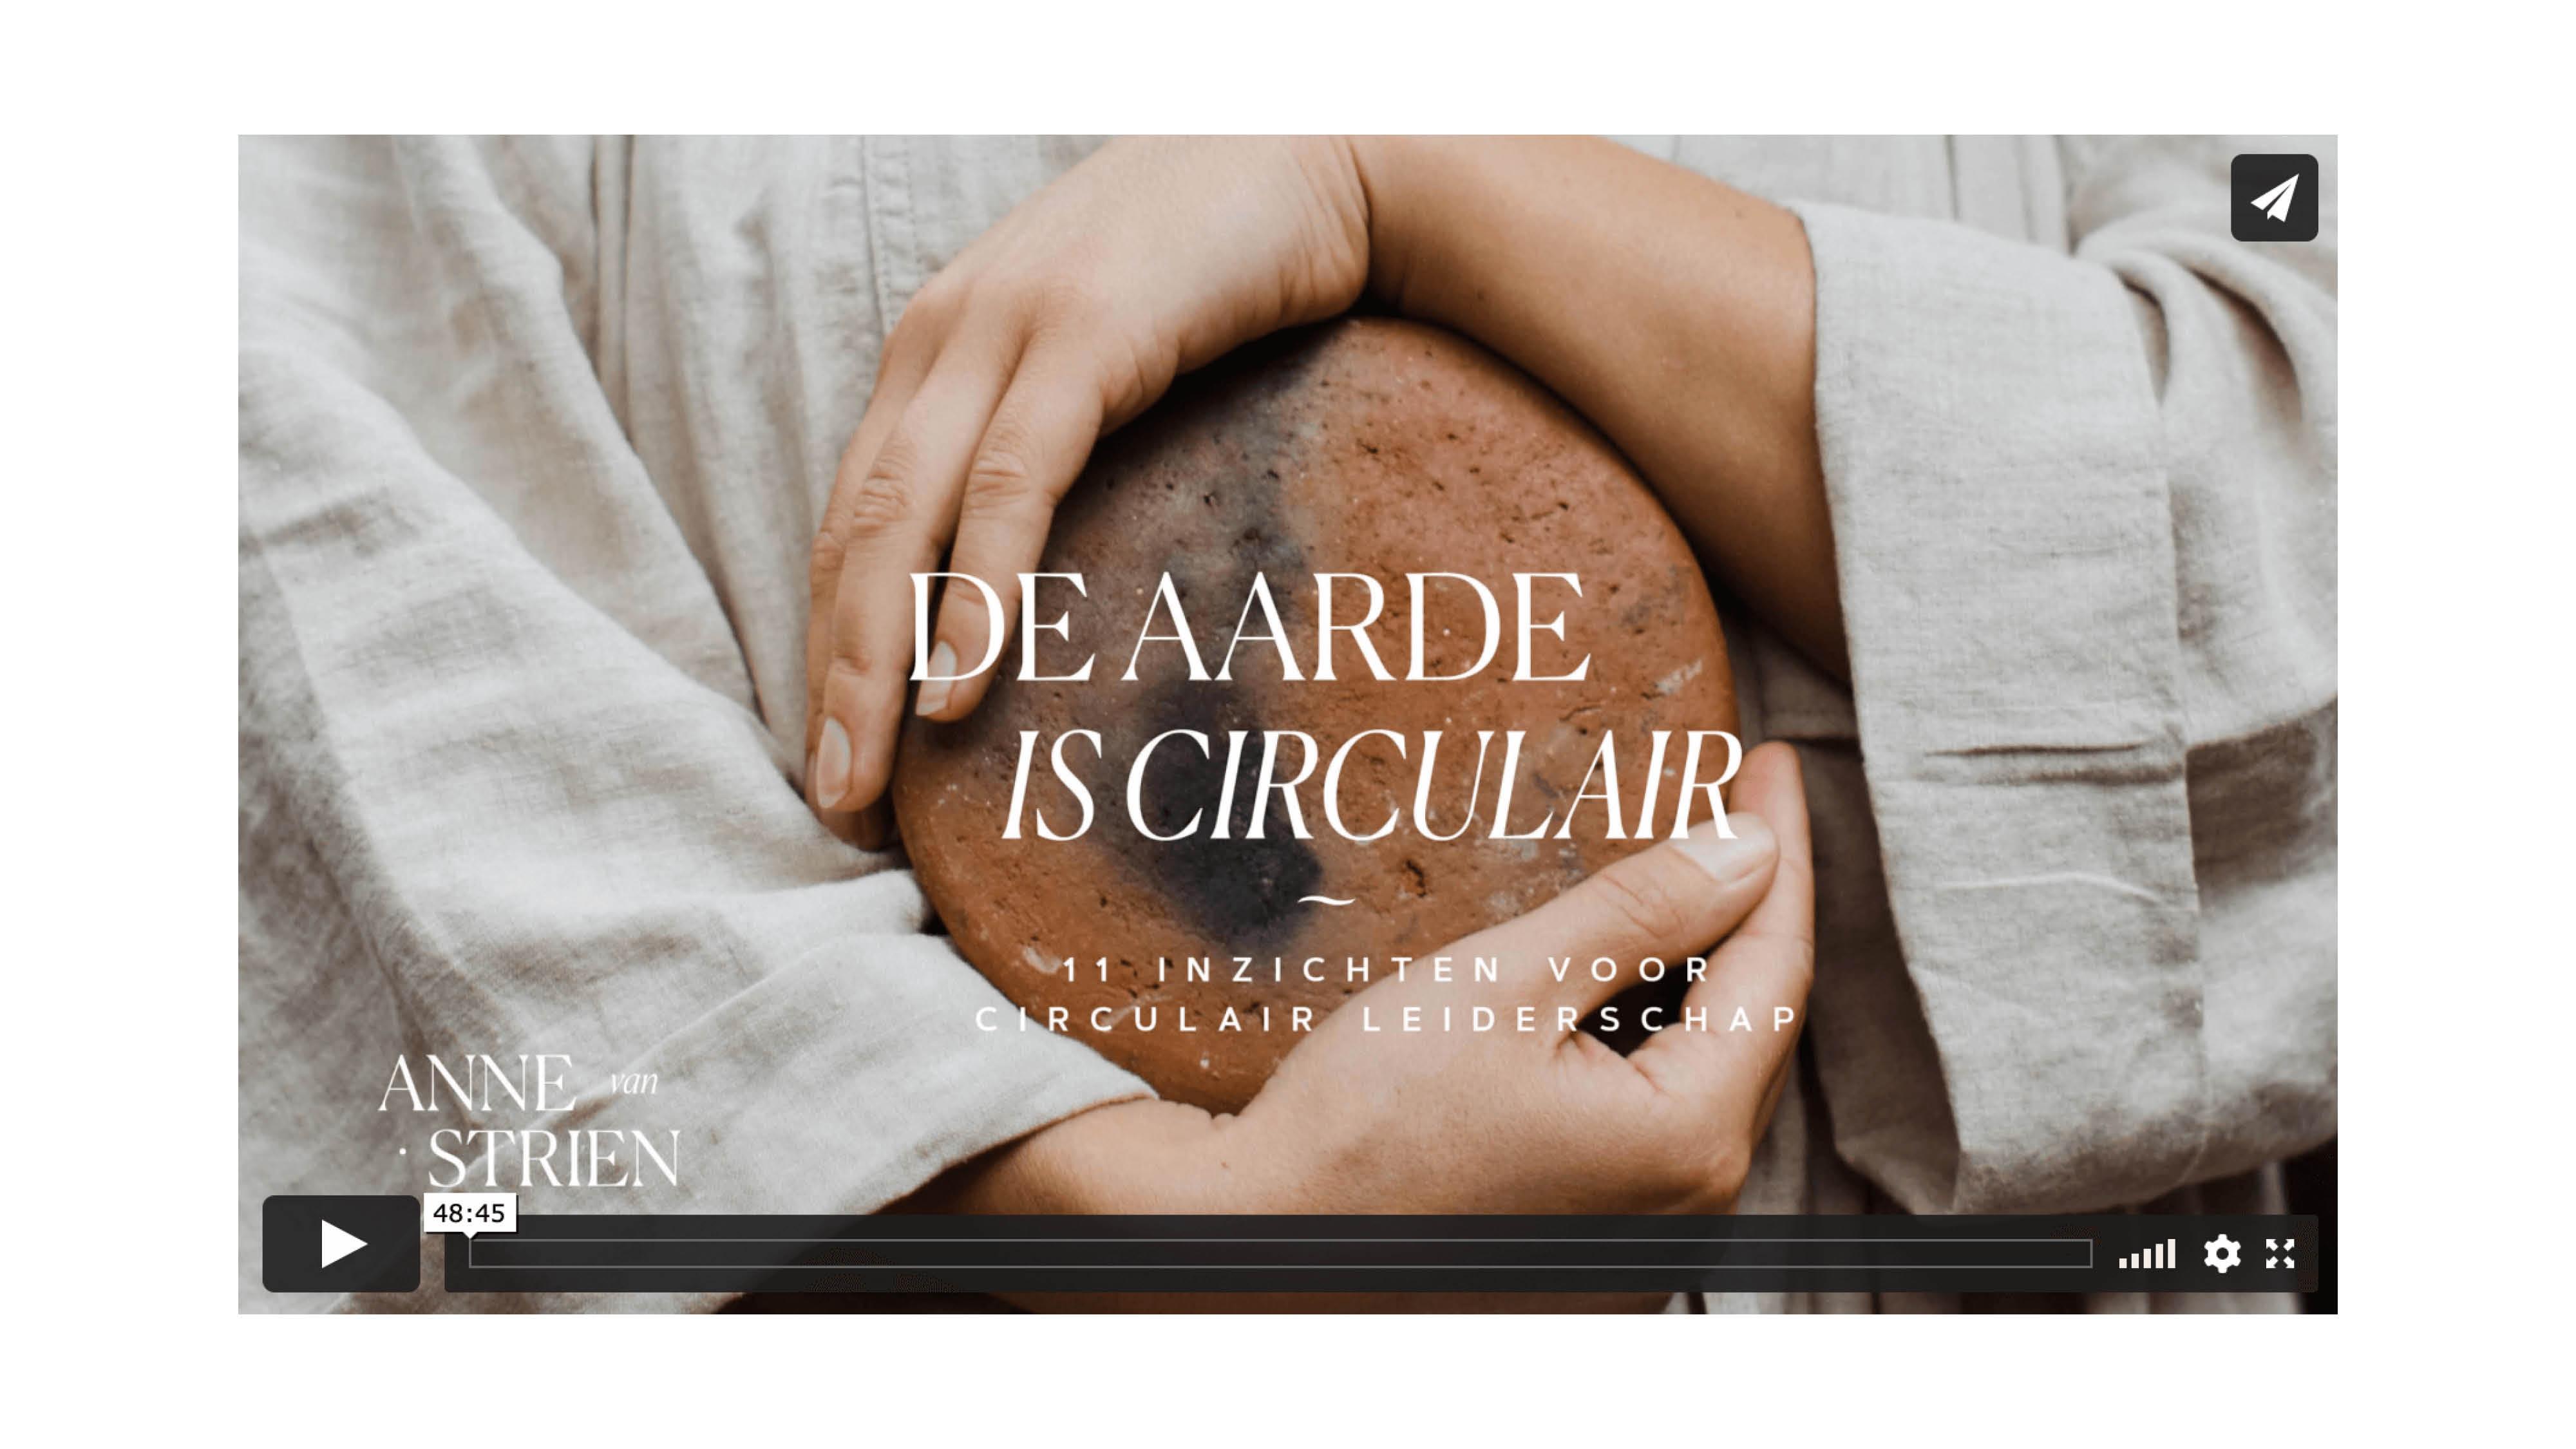 Leiderschap Circulaire Economie Circulair Circular leadership earth Aarde Conscious Bewustzijn